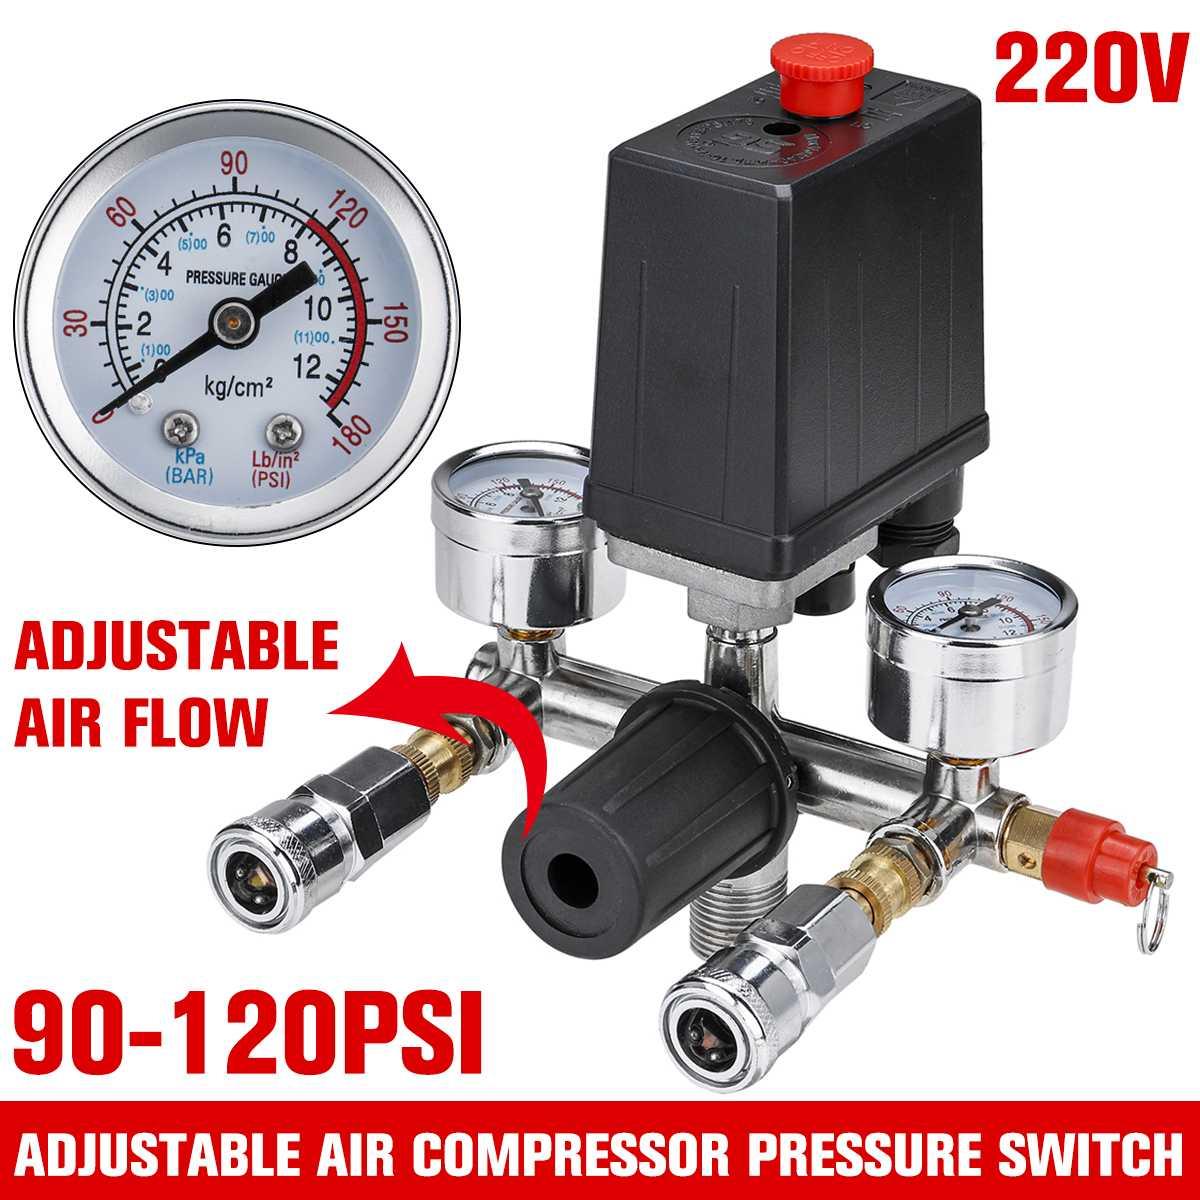 220V Air Compressor Pump Pressure Valve Switch Adjustable Air Flow Manifold Relief Regulator 90-120 PSI Control Valve with Gauge